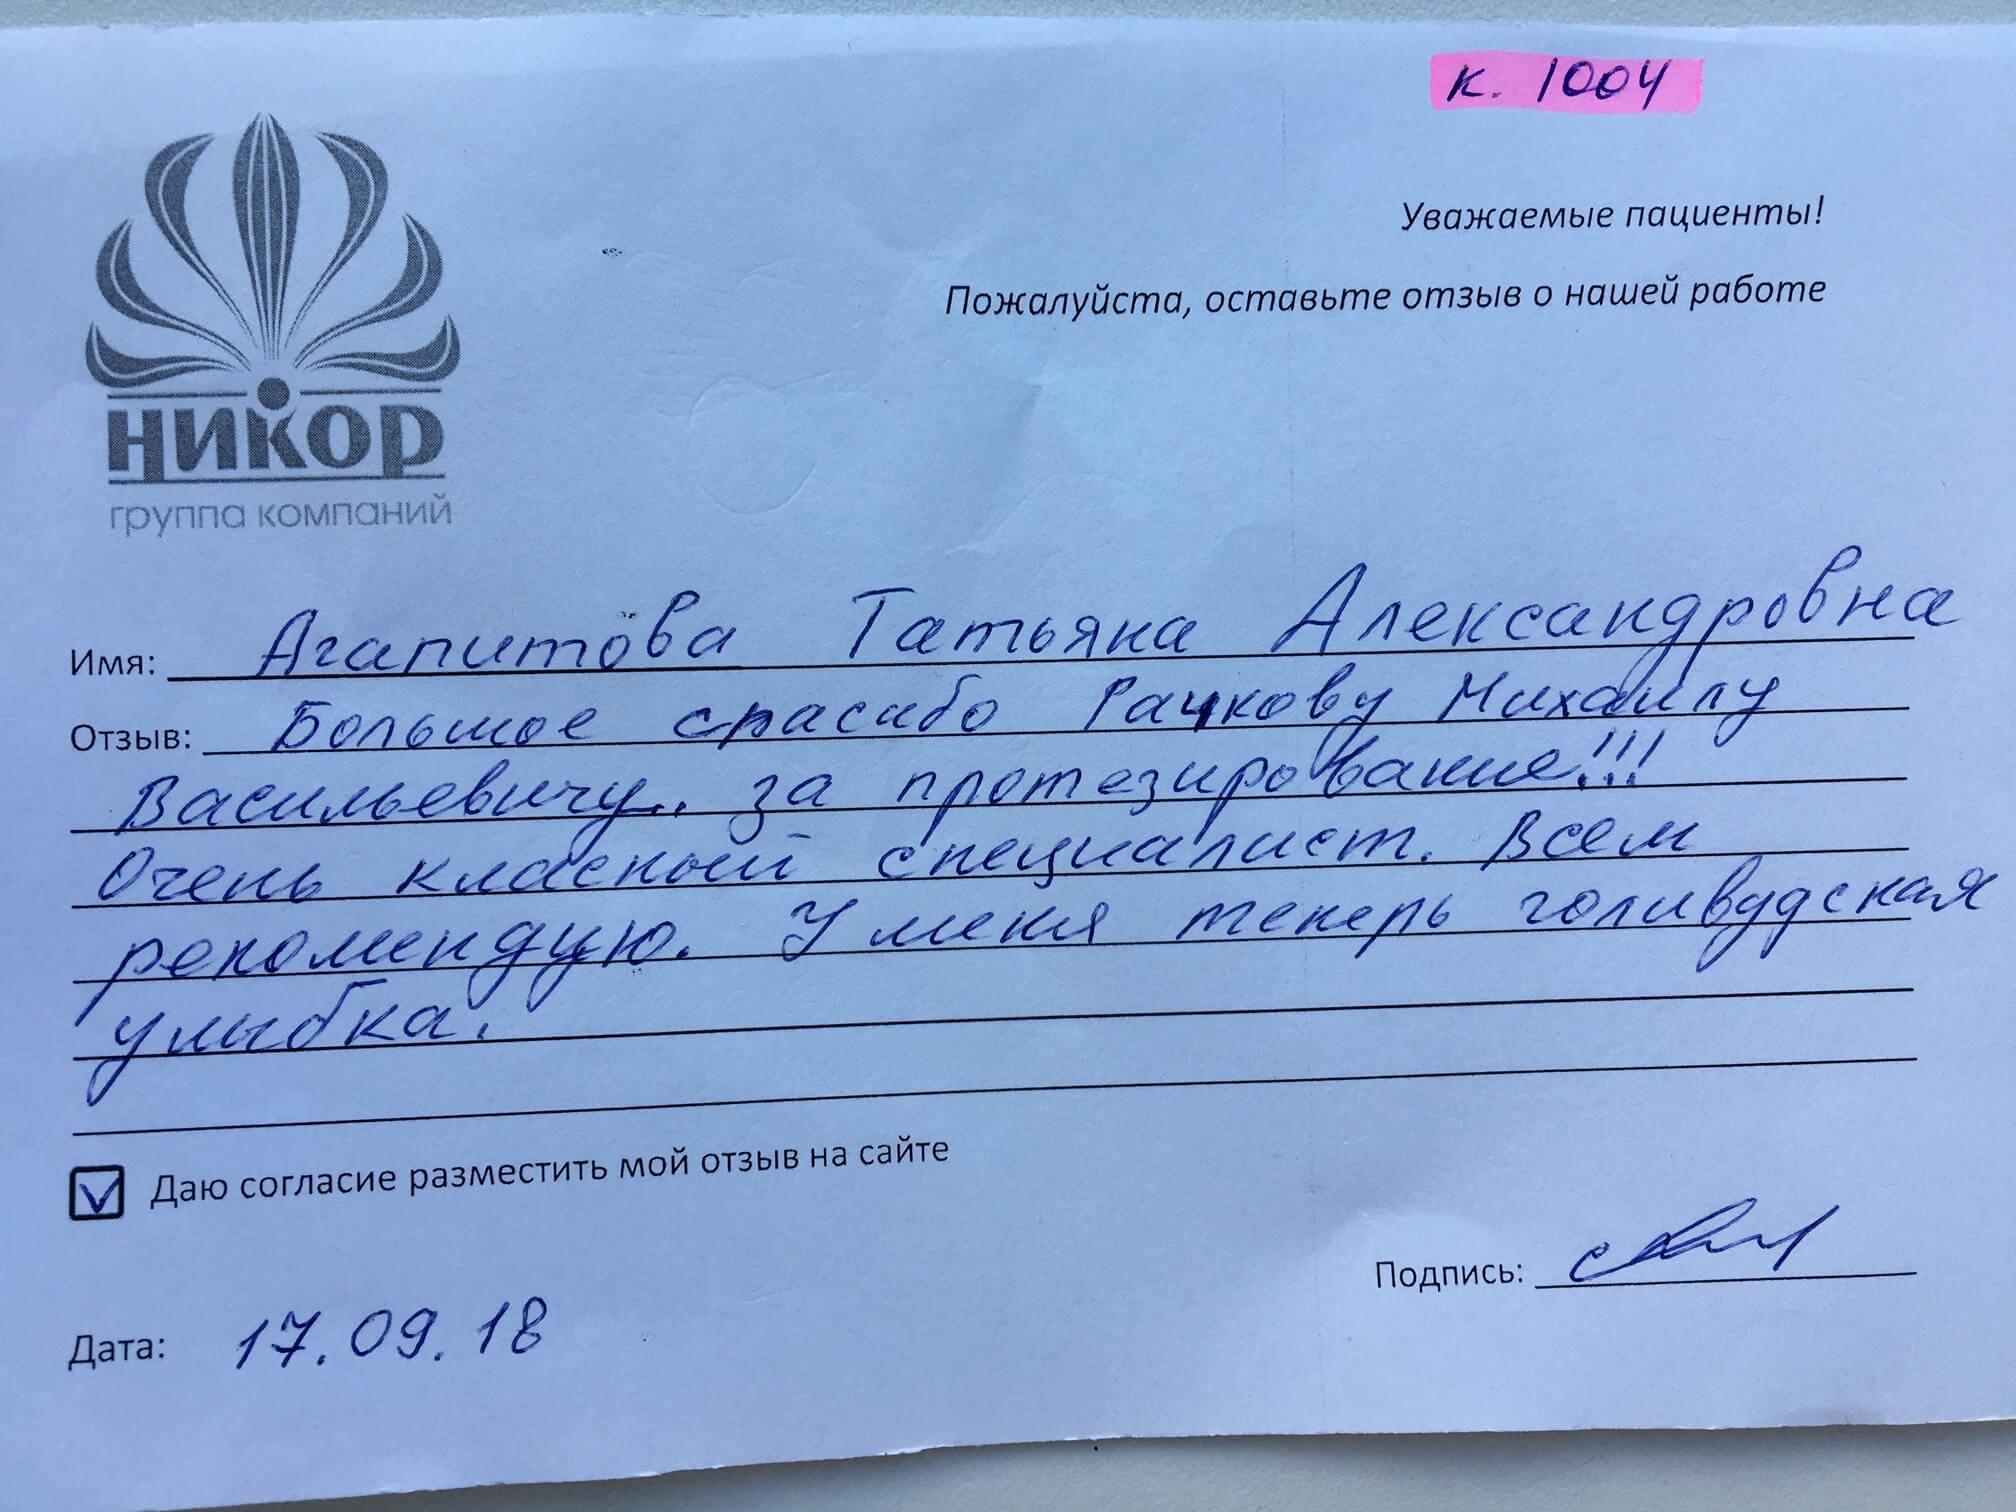 Агапитова Татьяна Александровна